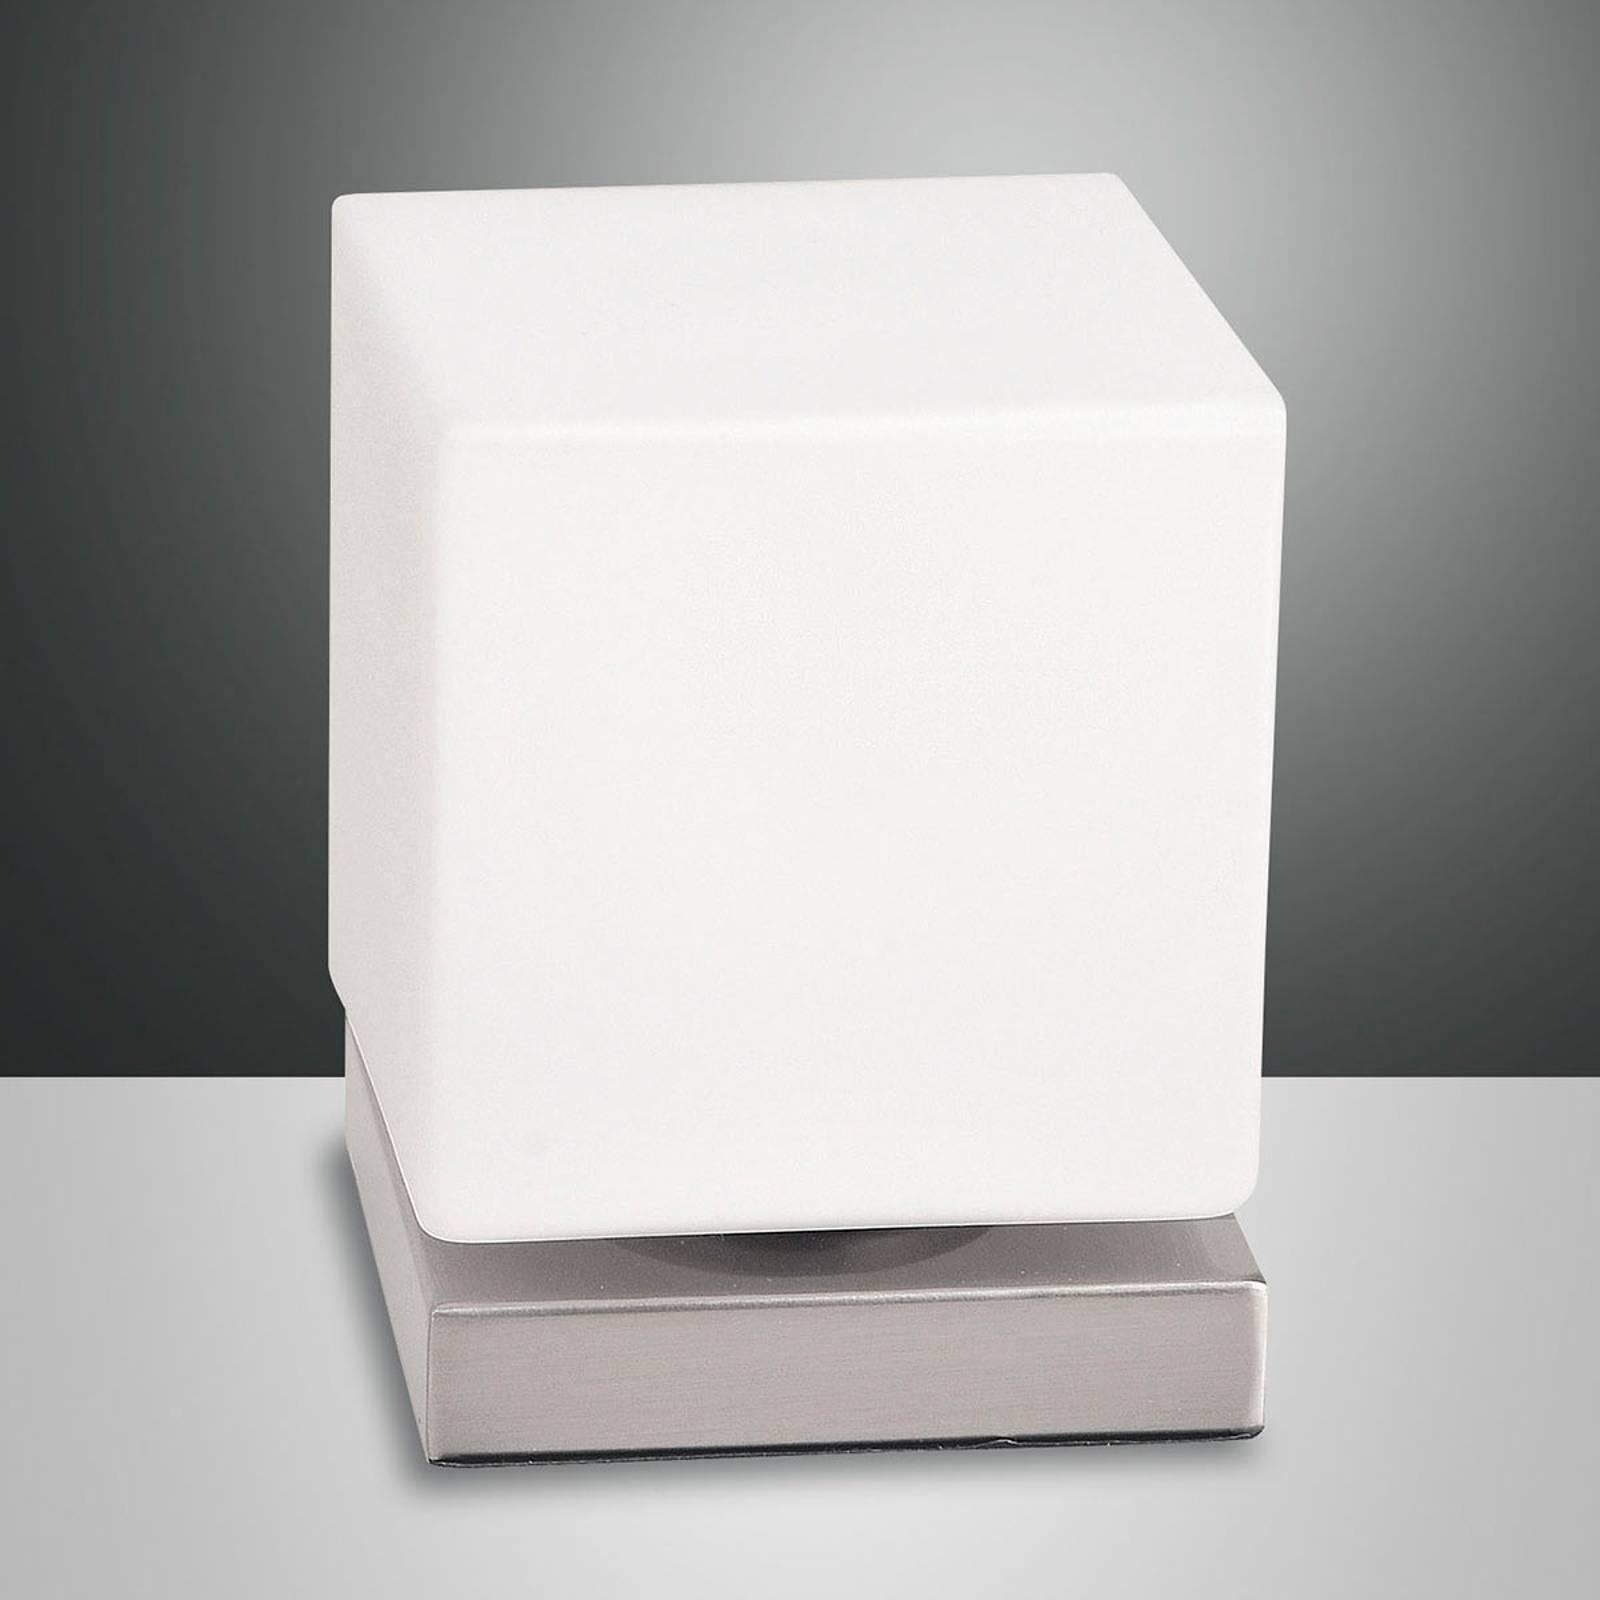 Lampe à poser LED Brenta nickel avec variateur